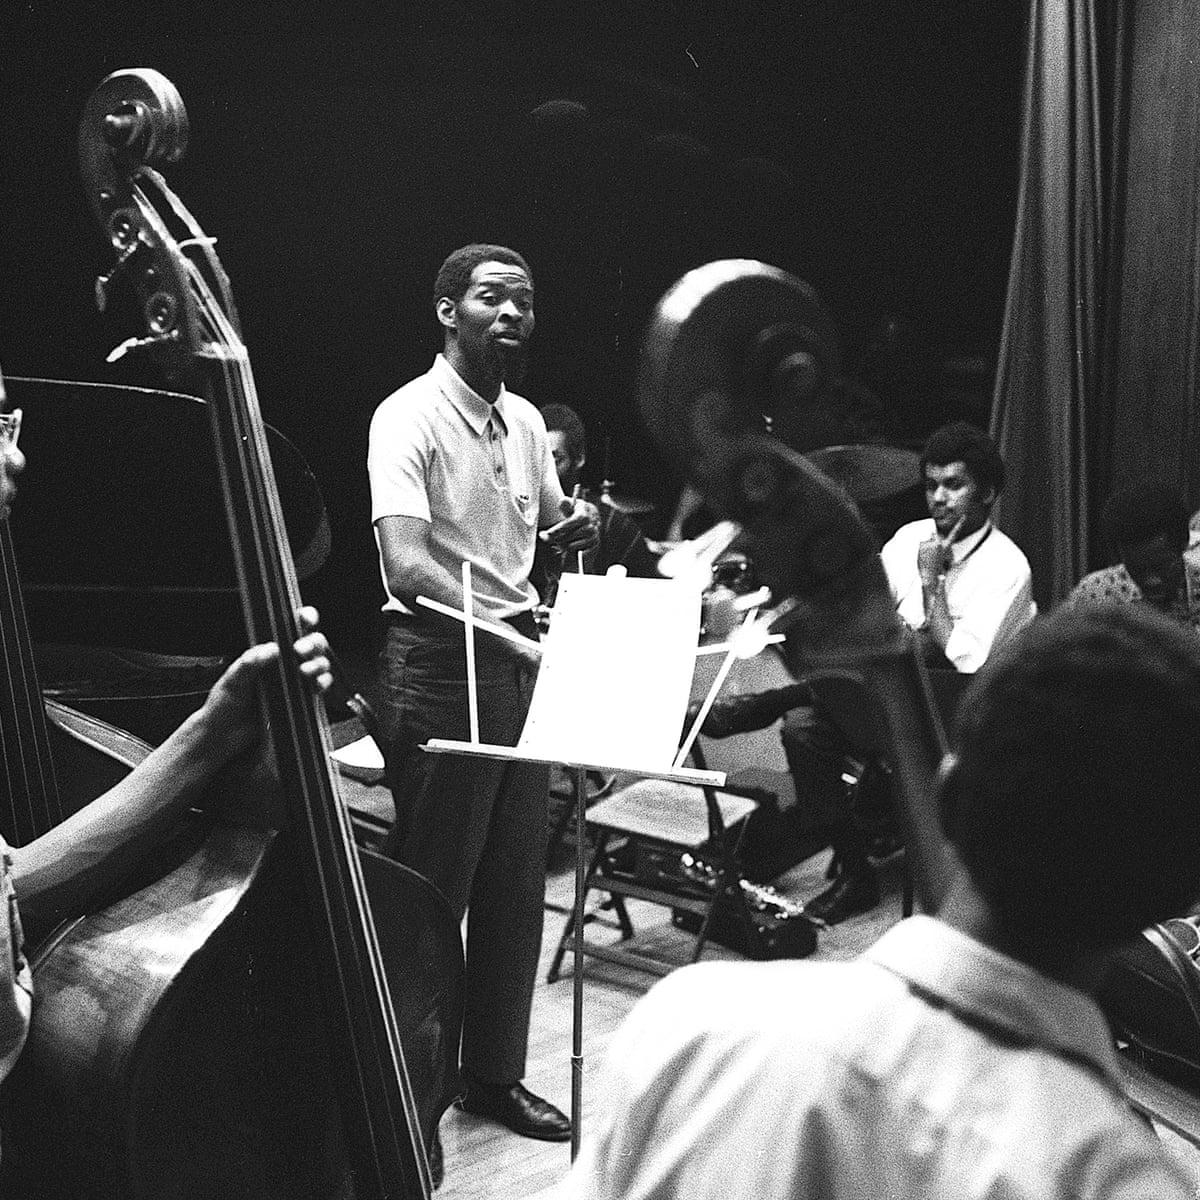 Muhal Richard Abrams obituary | Jazz | The Guardian